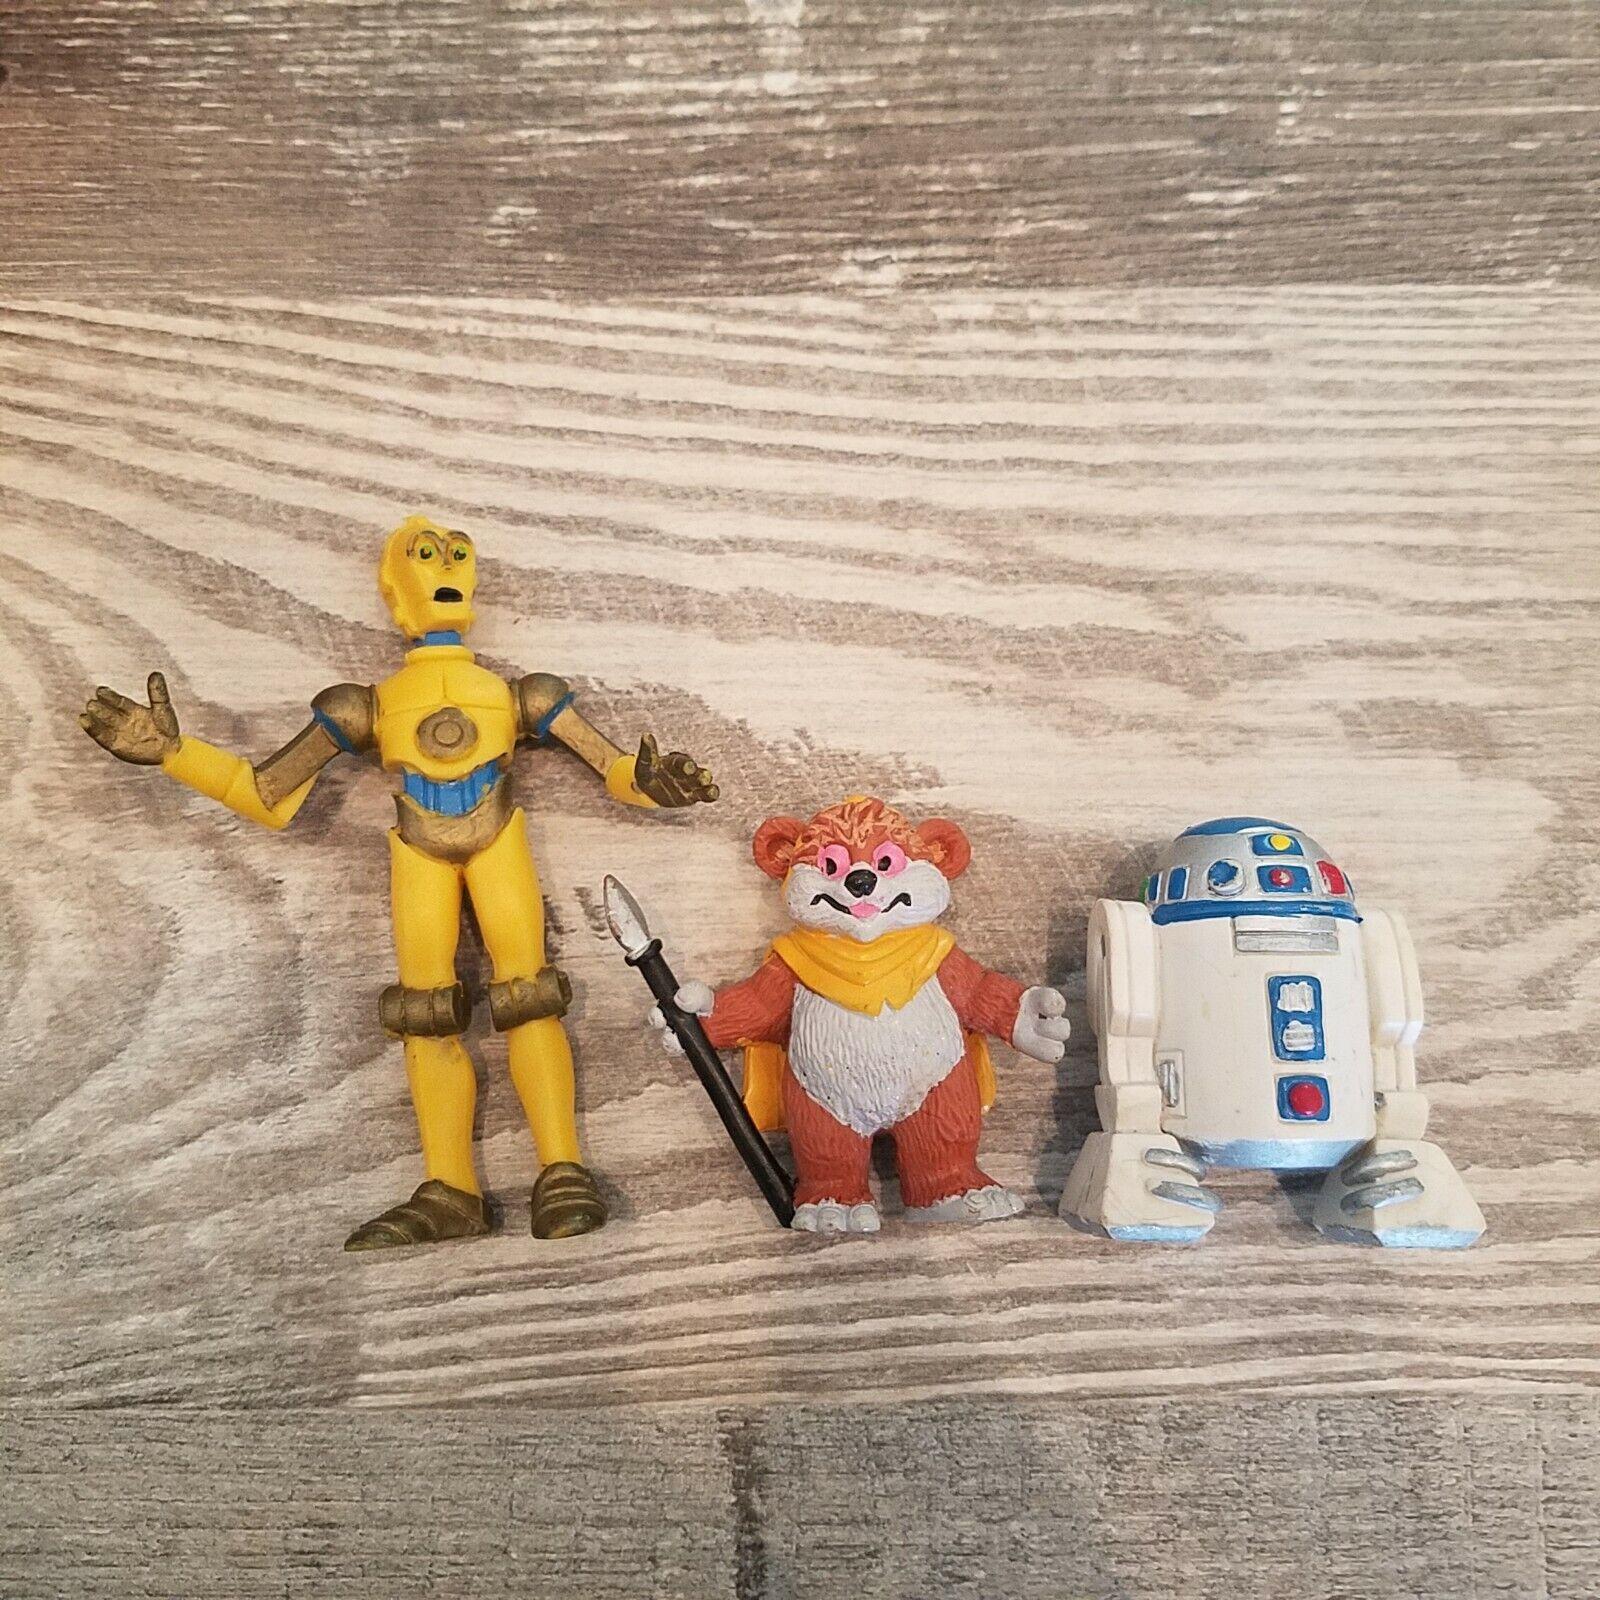 1986 PVC Lfl Estrella Wars Droids Ewoks Series Animadas Dibujos Animados Wicket C-3PO R2D2